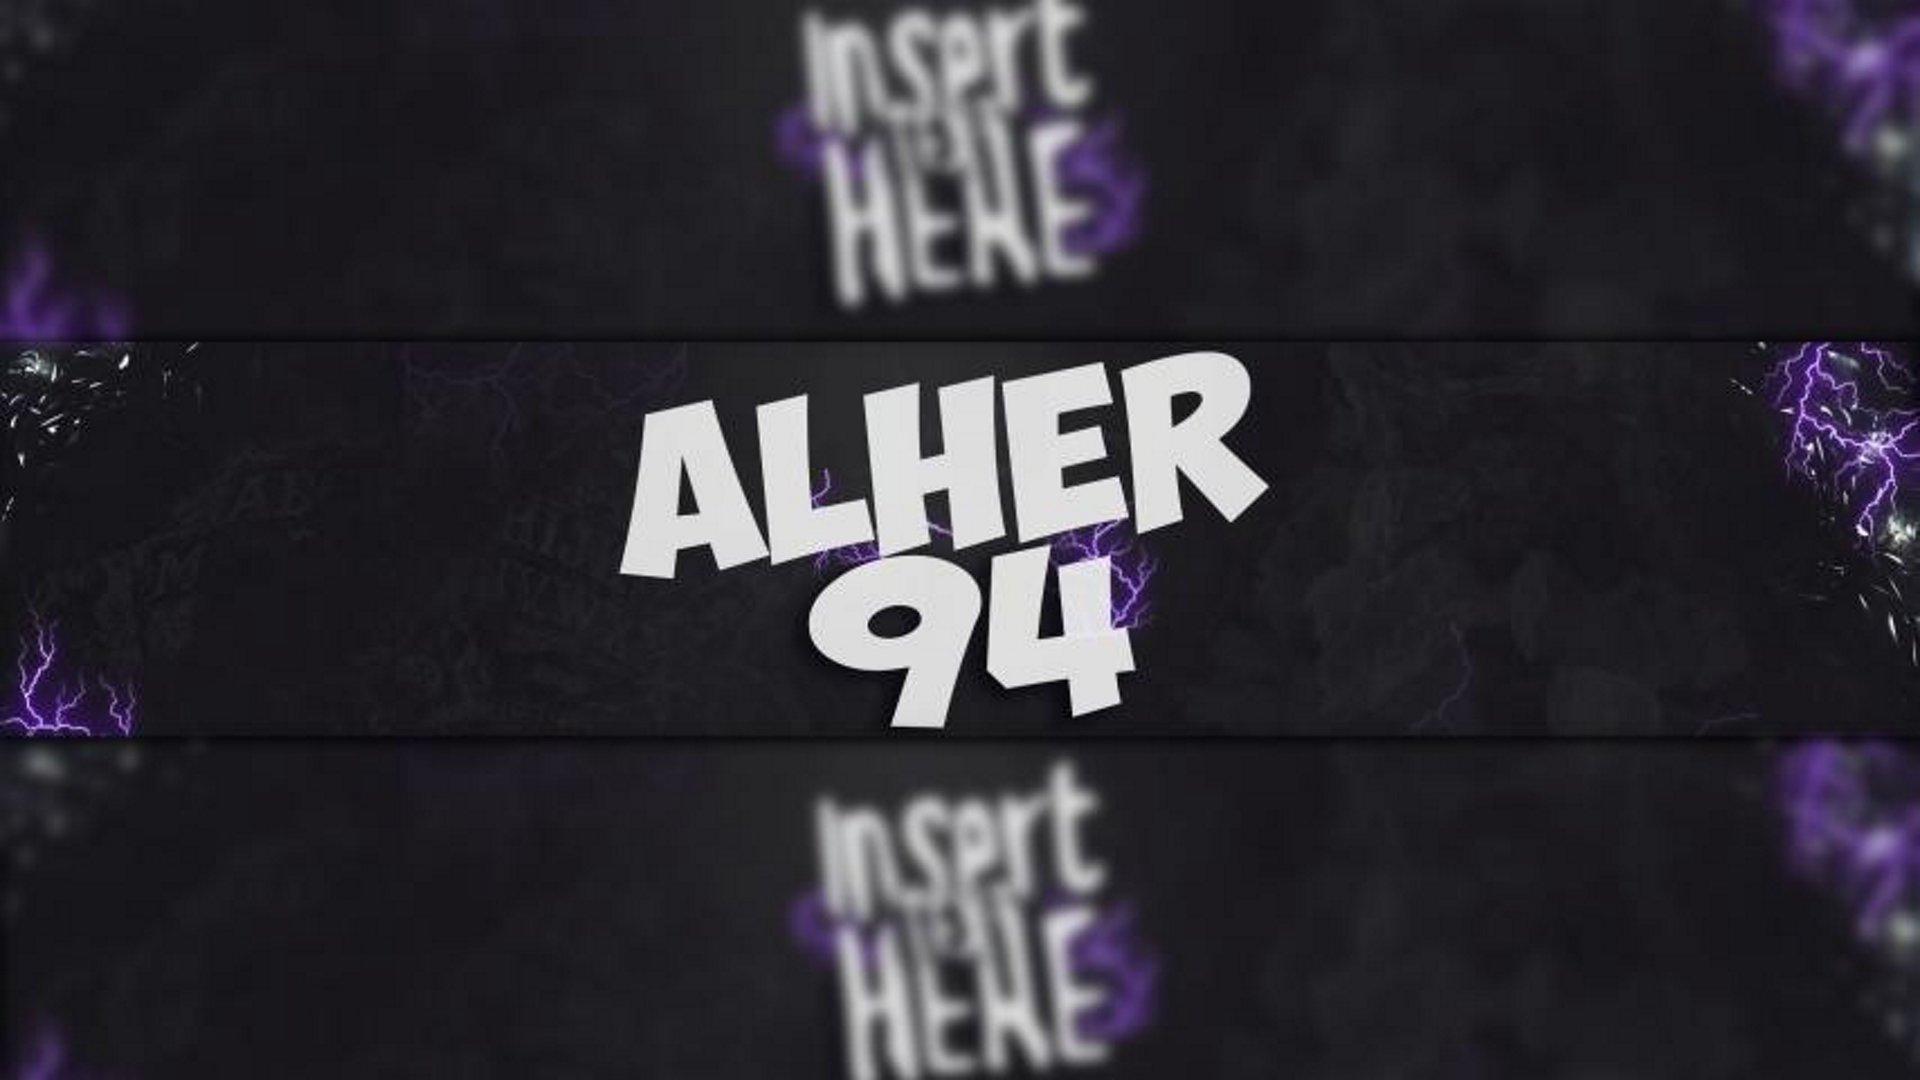 AlHer94